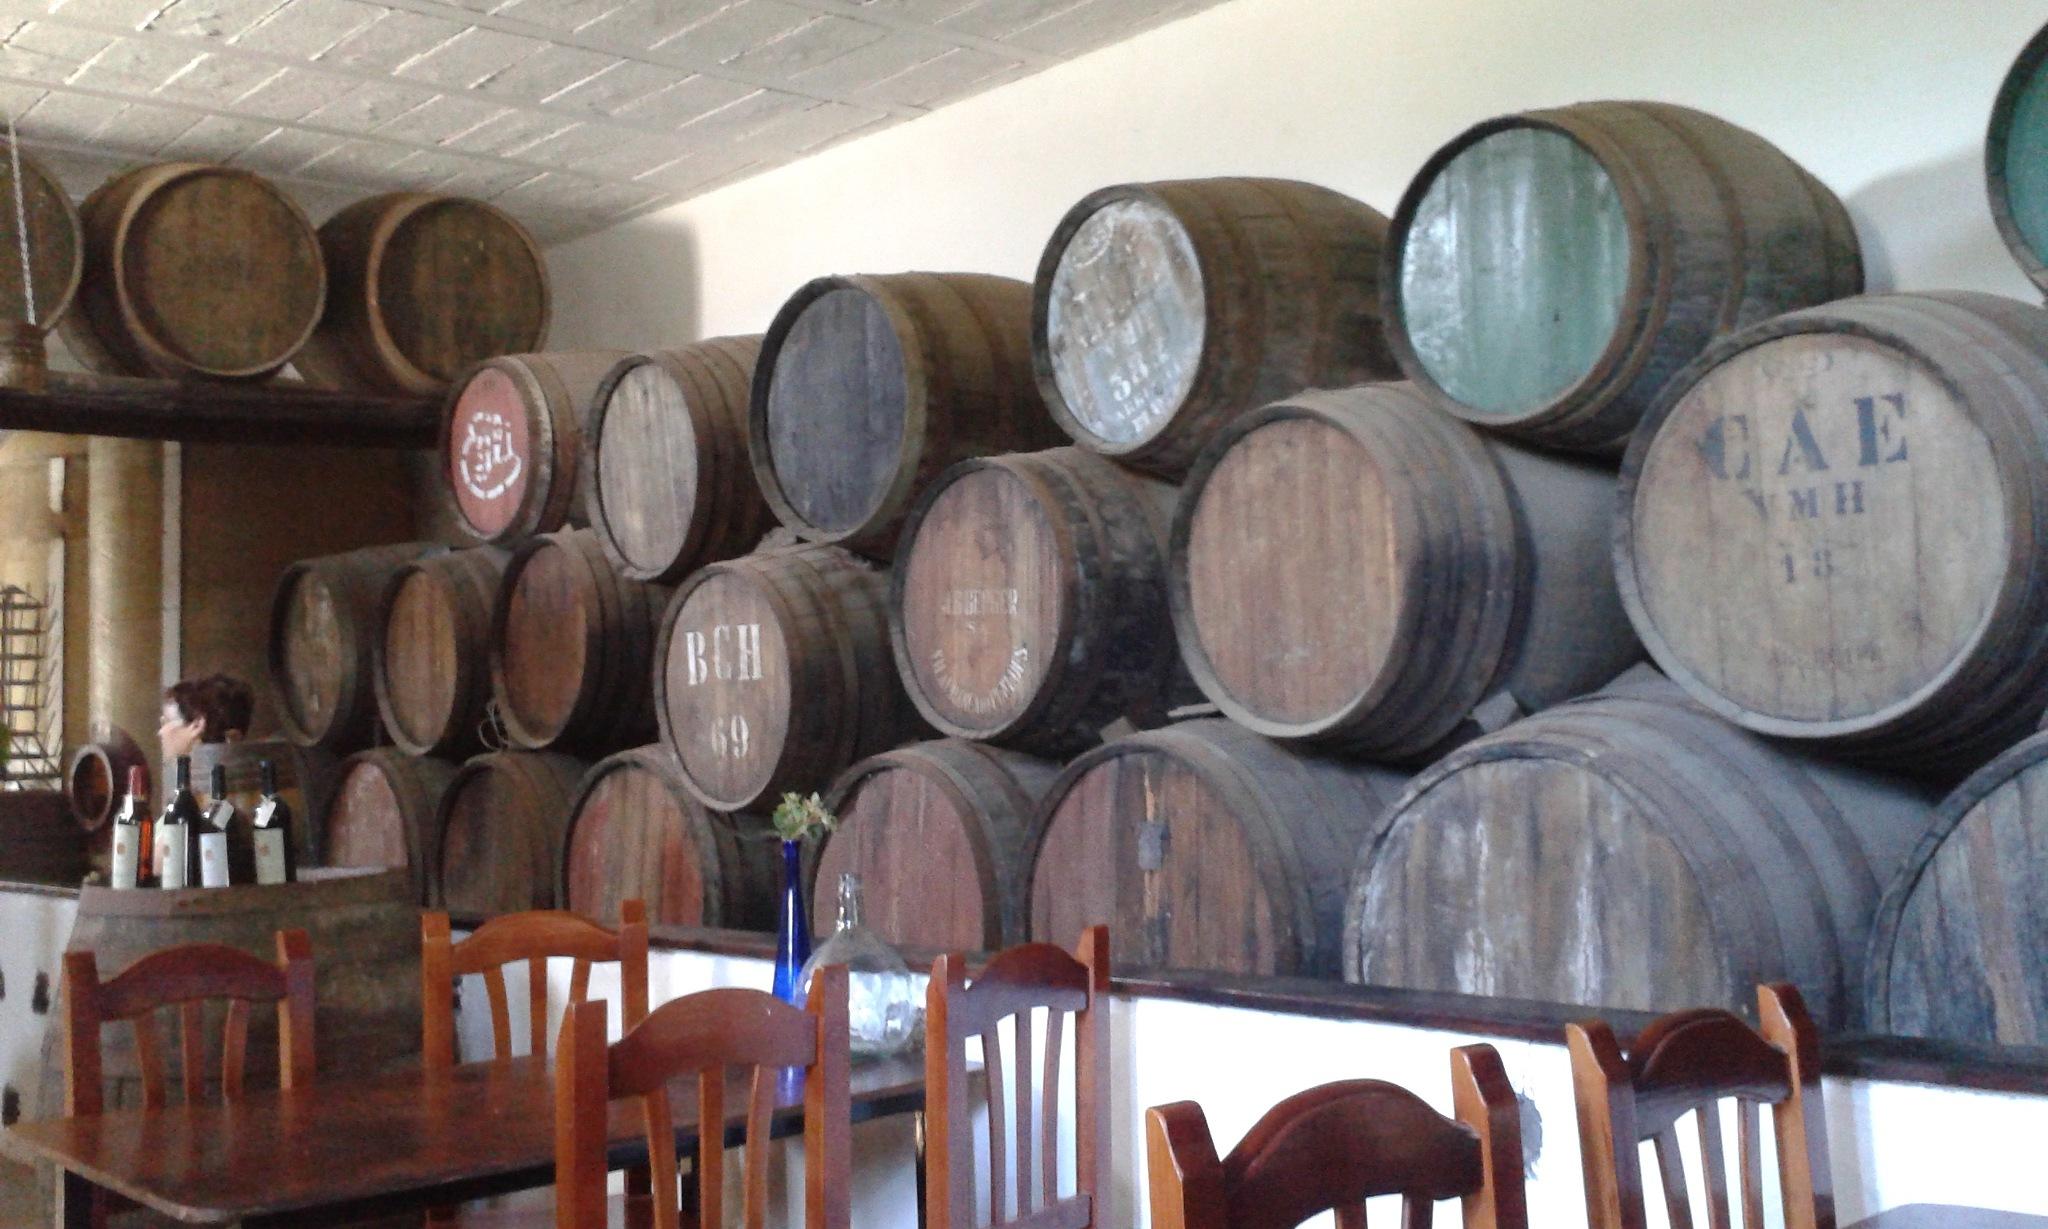 Inside a bodega (wine cellar) by Launa